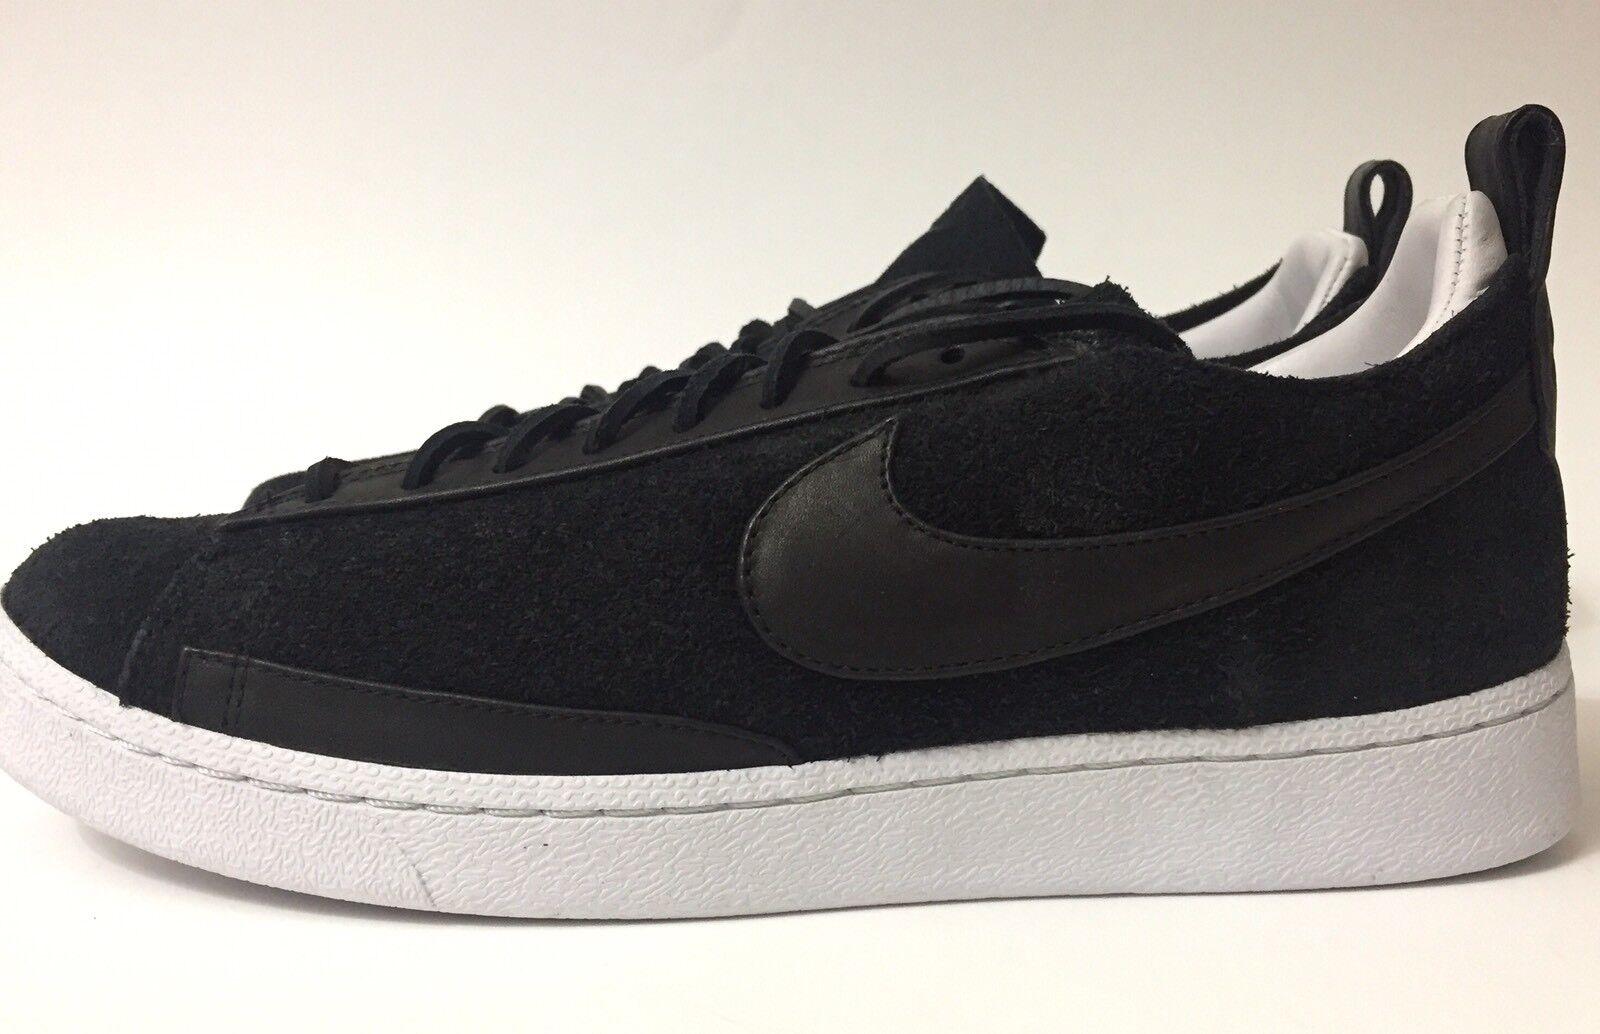 New Mens Nike Blazer Low CS TC Sz10.5 Shoes Sneakers Skating Skate Suede Black Casual wild